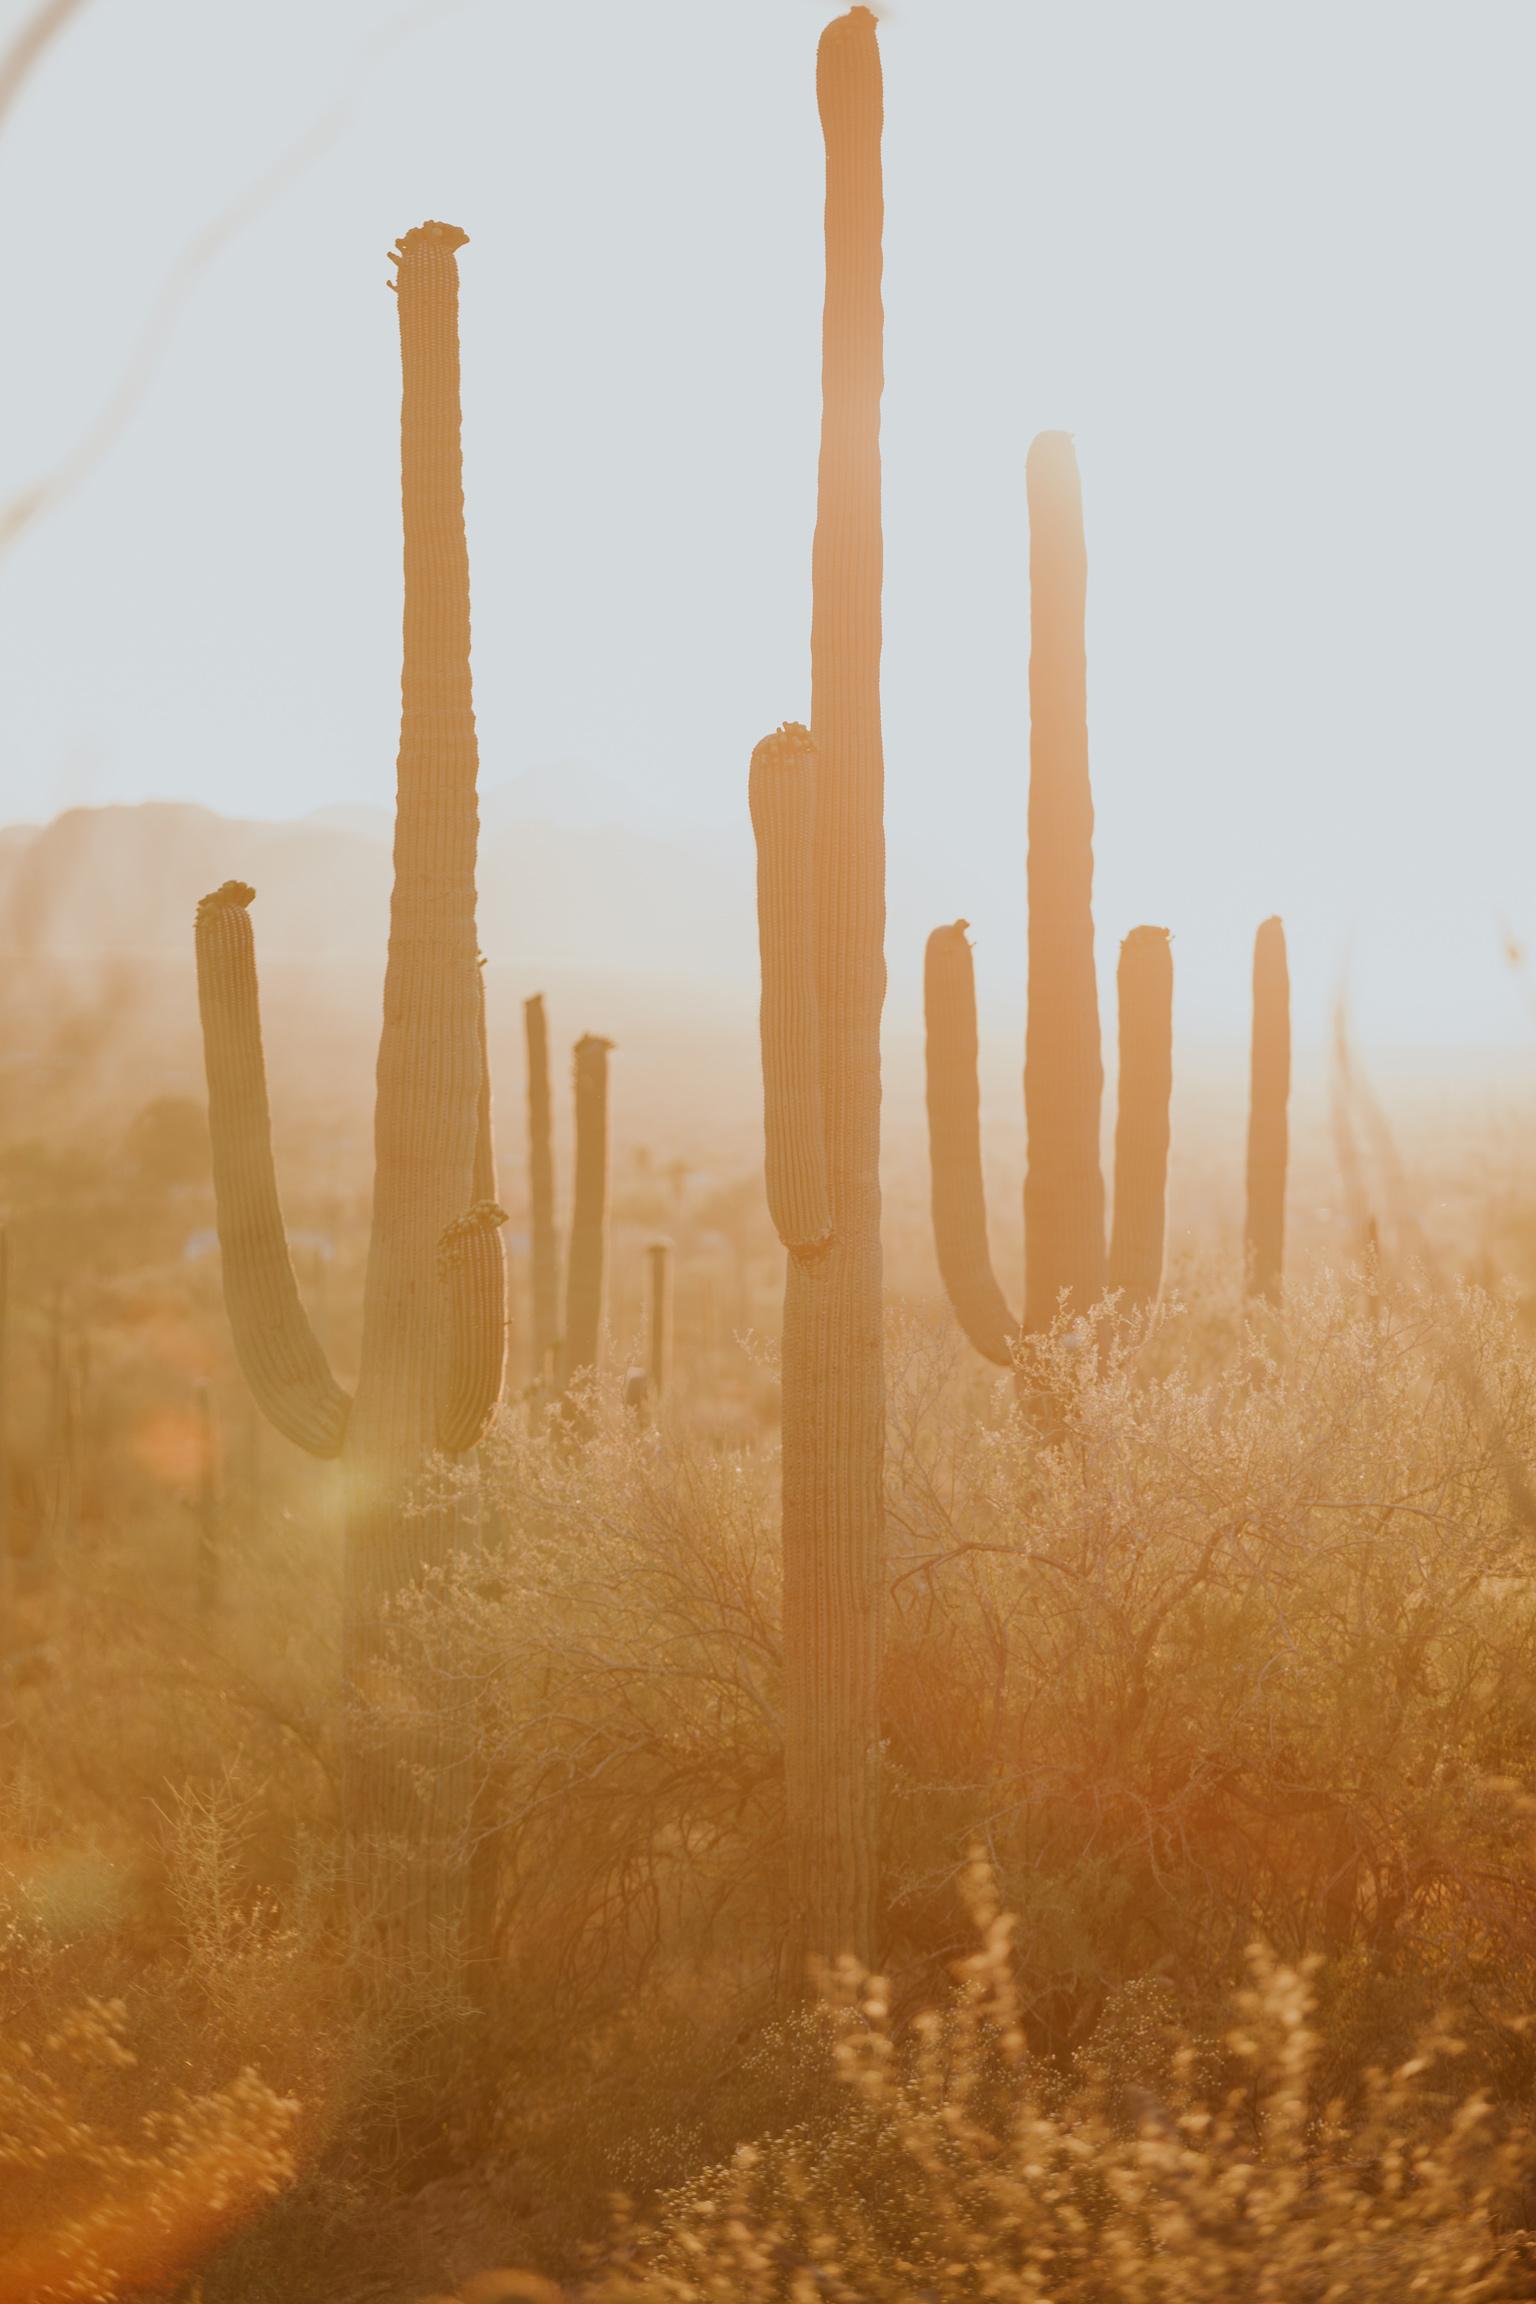 CindyGiovagnoli_Tucson_Arizona_Saguaro_National_Park_cactus_sunset_blooming_spring_sunset_petroglyphs_Native_American_indigenous-013.jpg